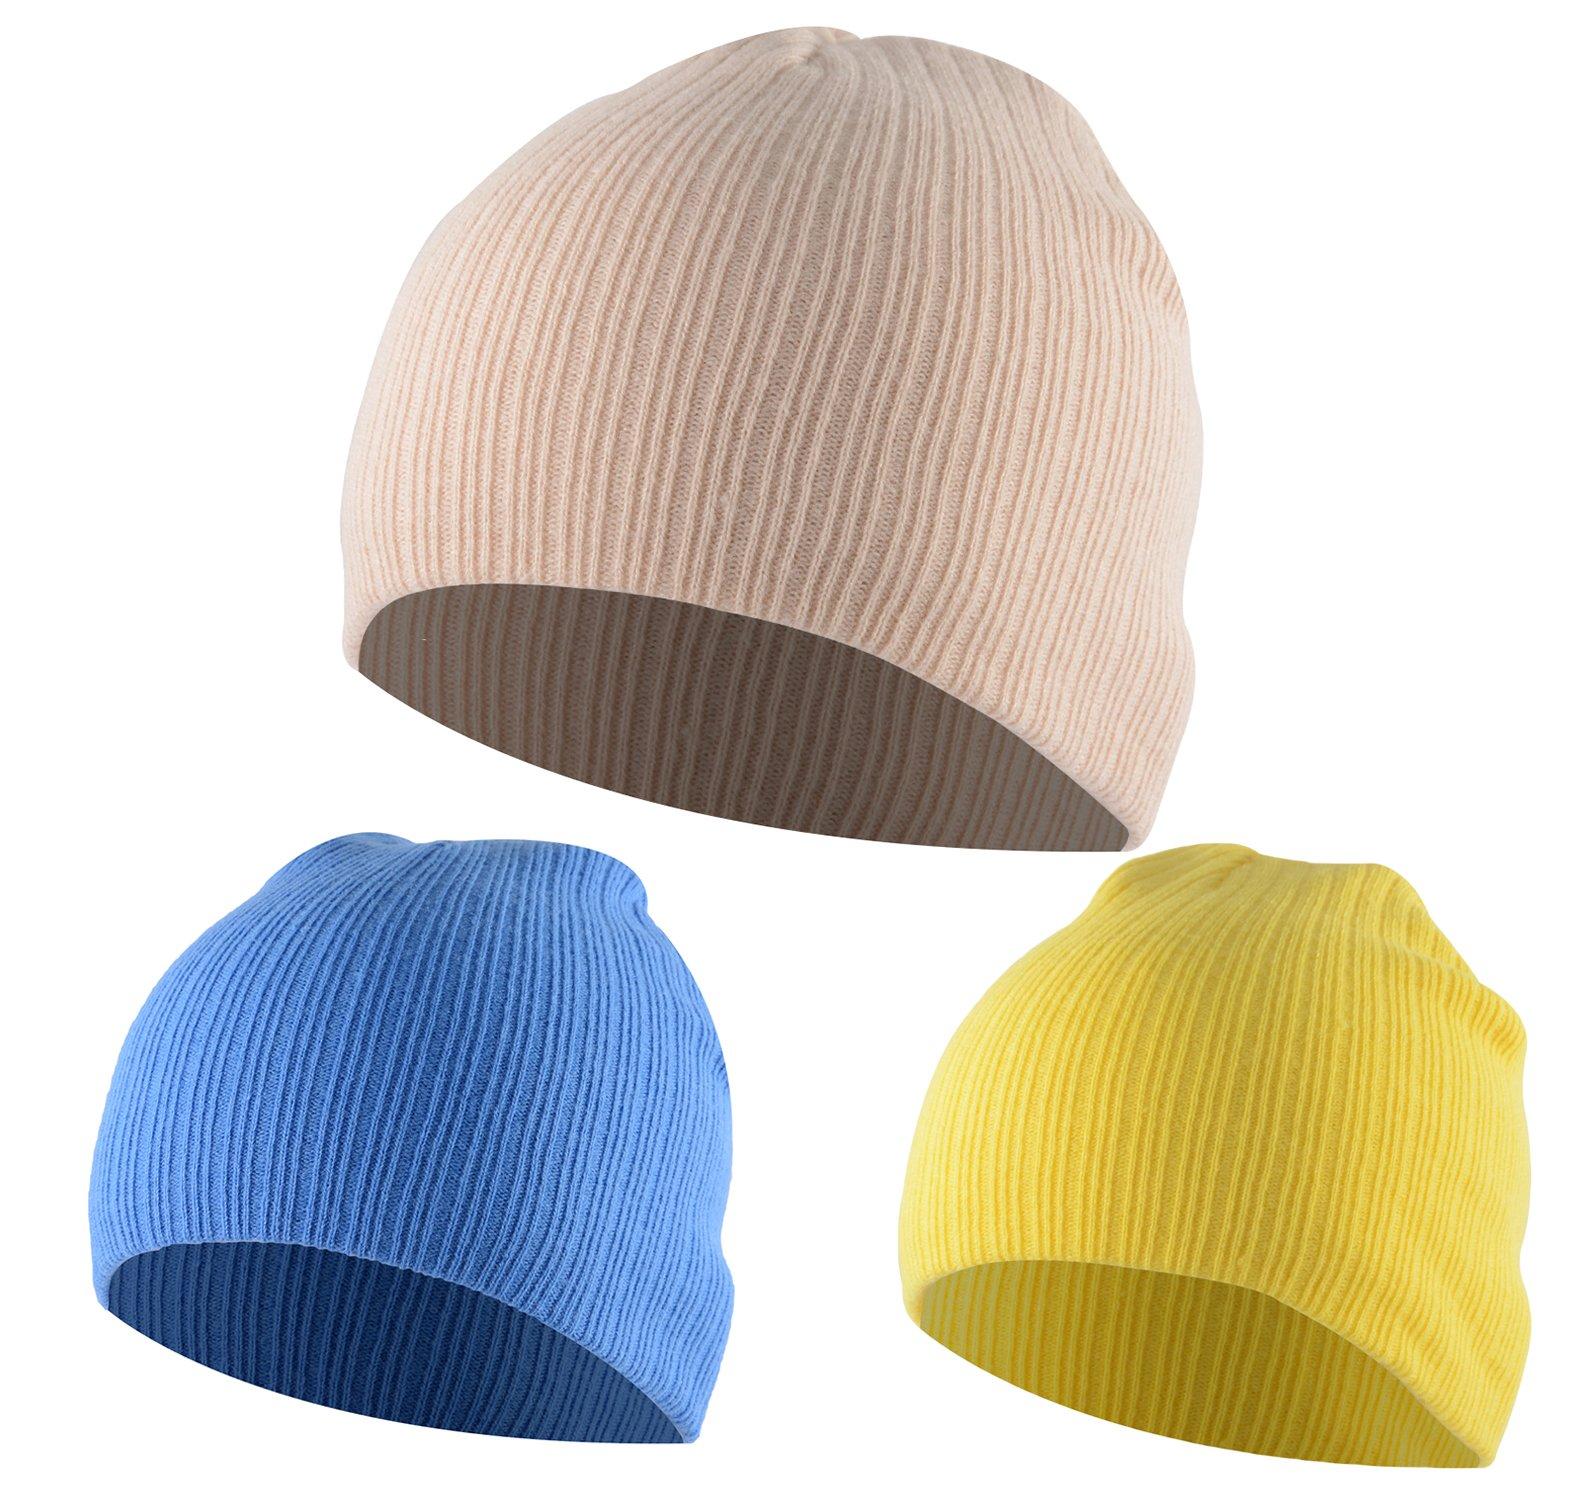 American Trends Unisex Baby Newborns Knitted Caps Cute Soft Toddler Cotton Beanies Winter Warm Hat 3 Pack Bright Yellow Dark Blue Beige